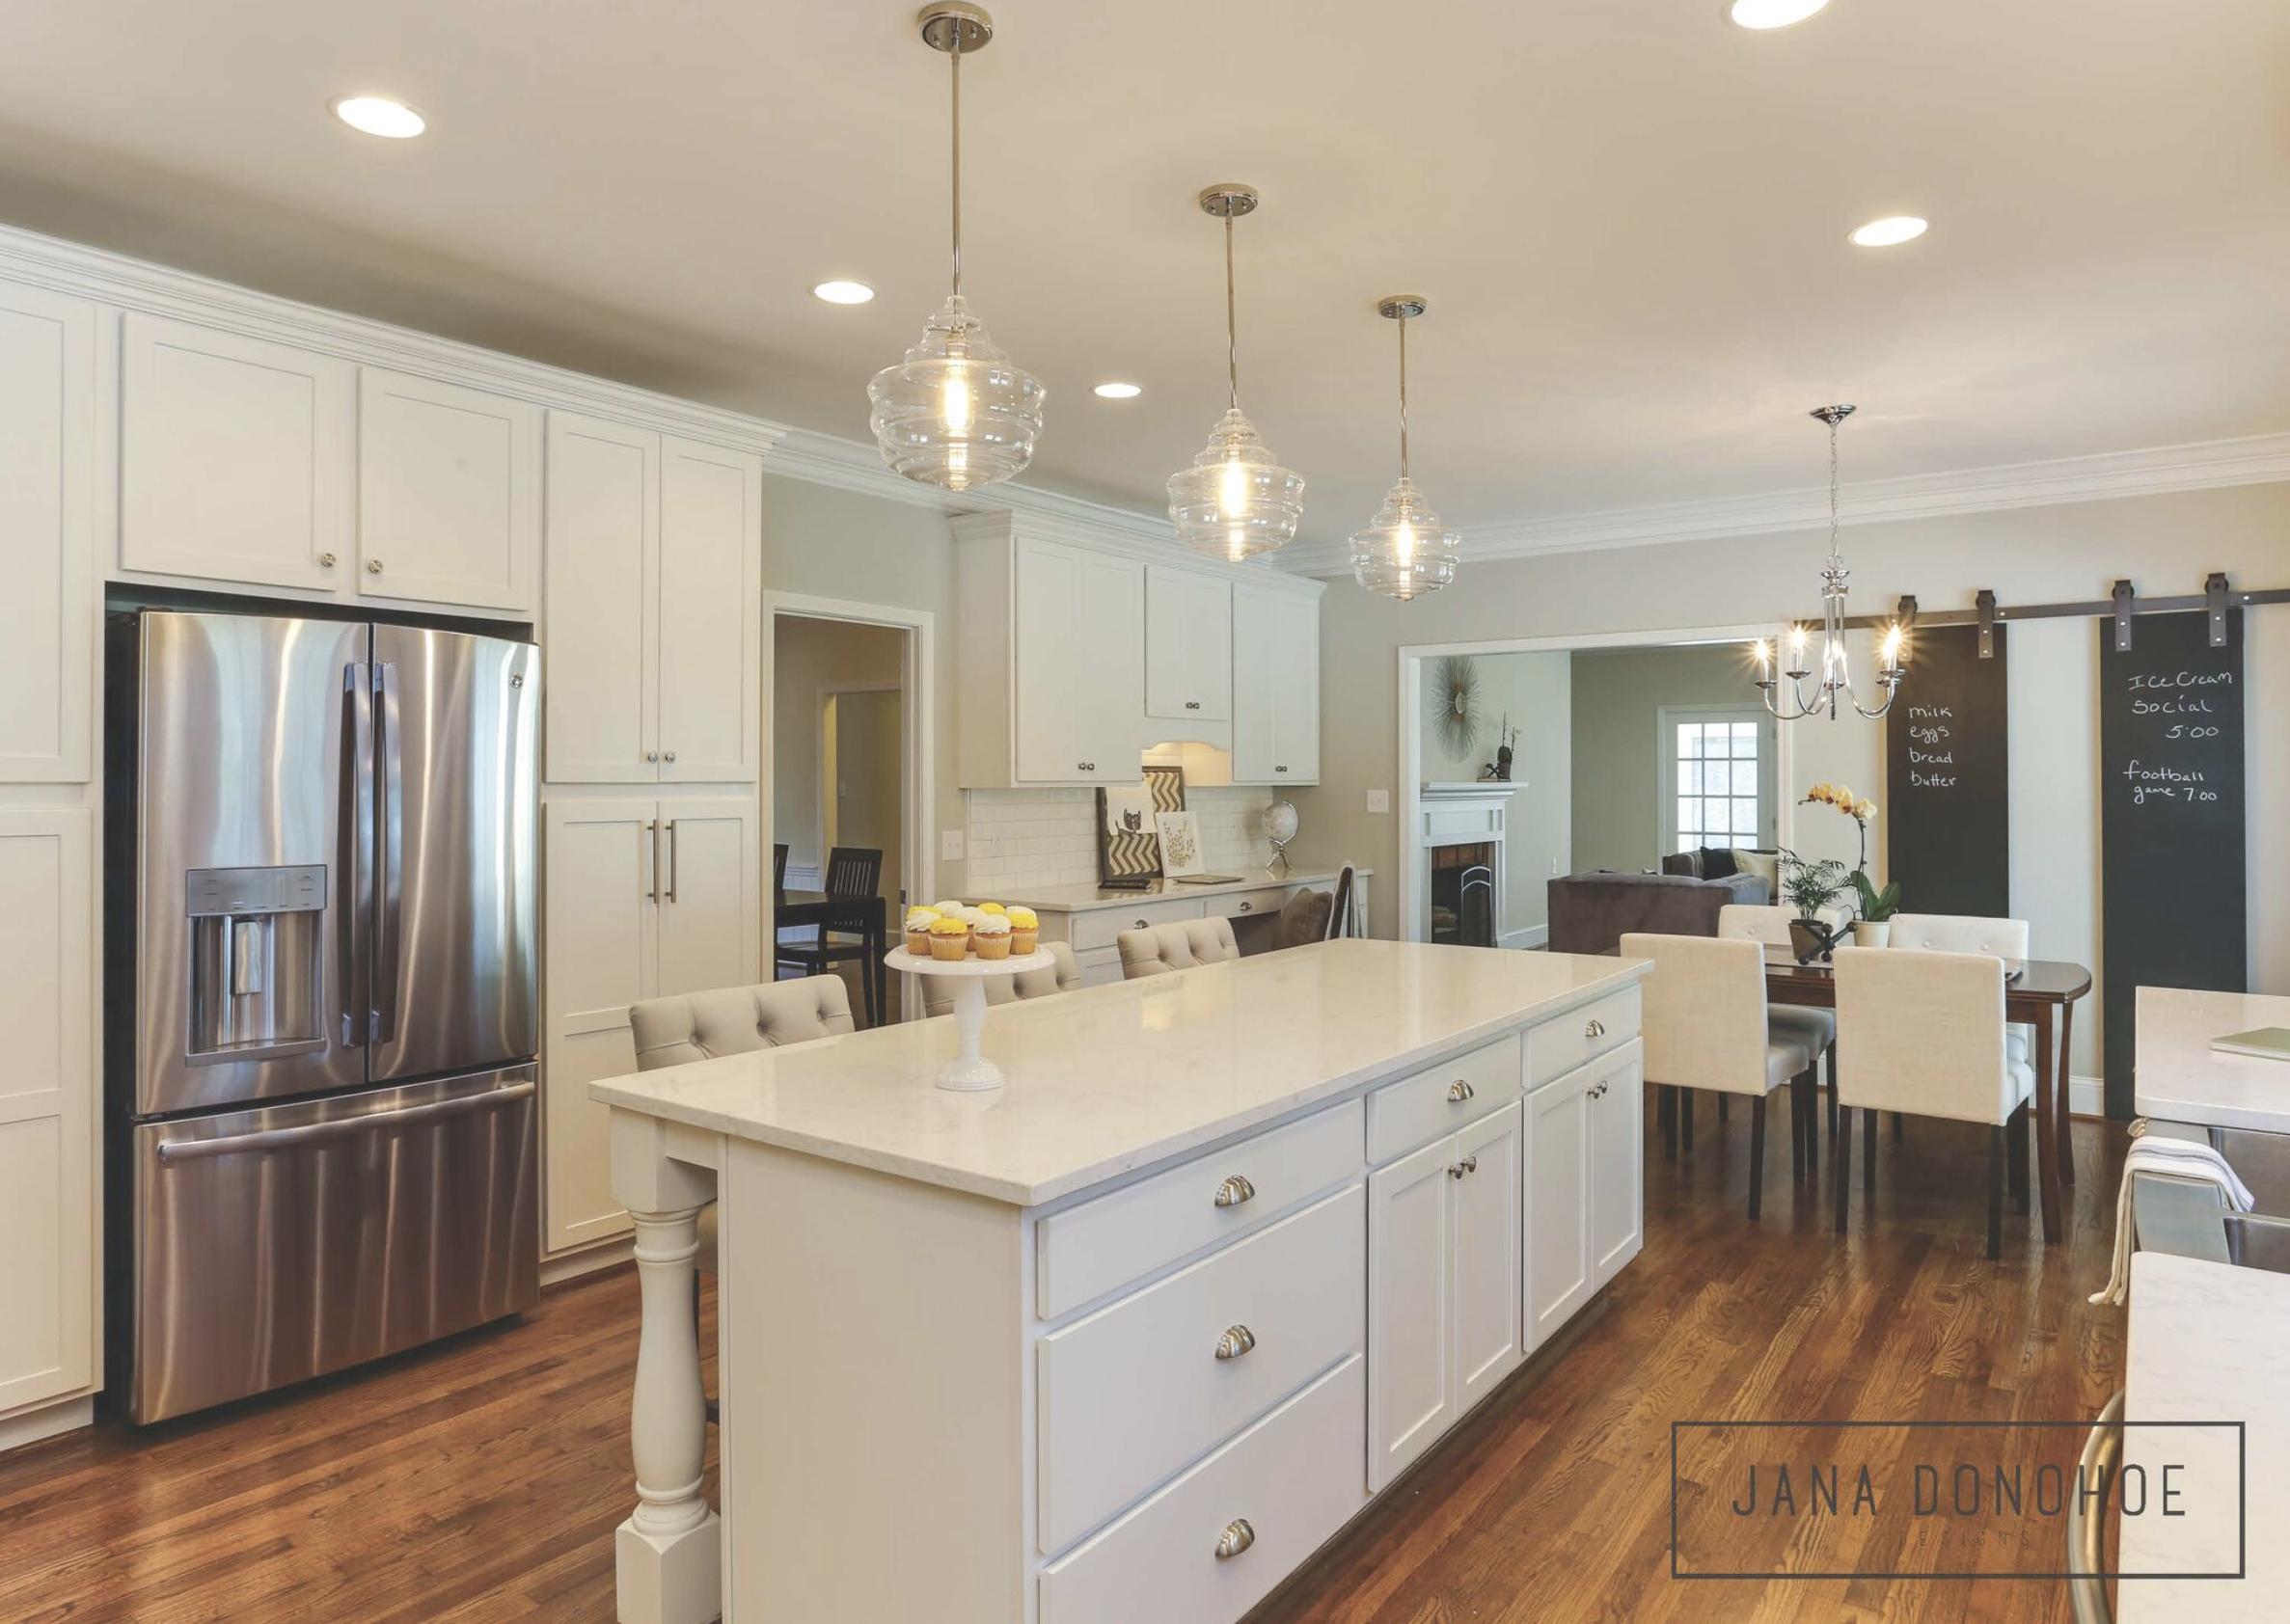 Kitchen design by Jana Donohoe Designs, Fayetteville, North Carolina